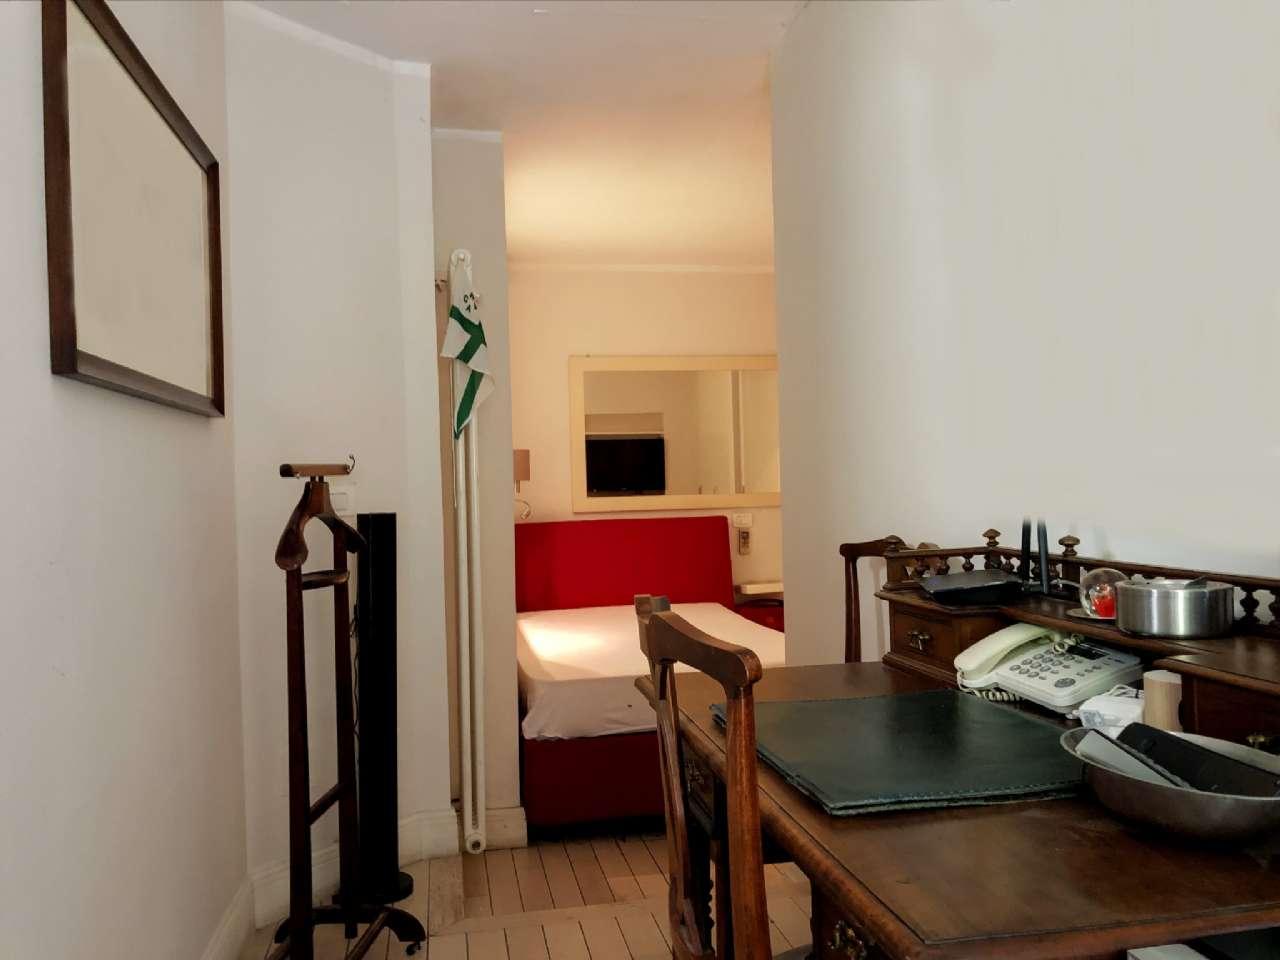 Appartamento, Via dei Monti Parioli, Roma, foto 9